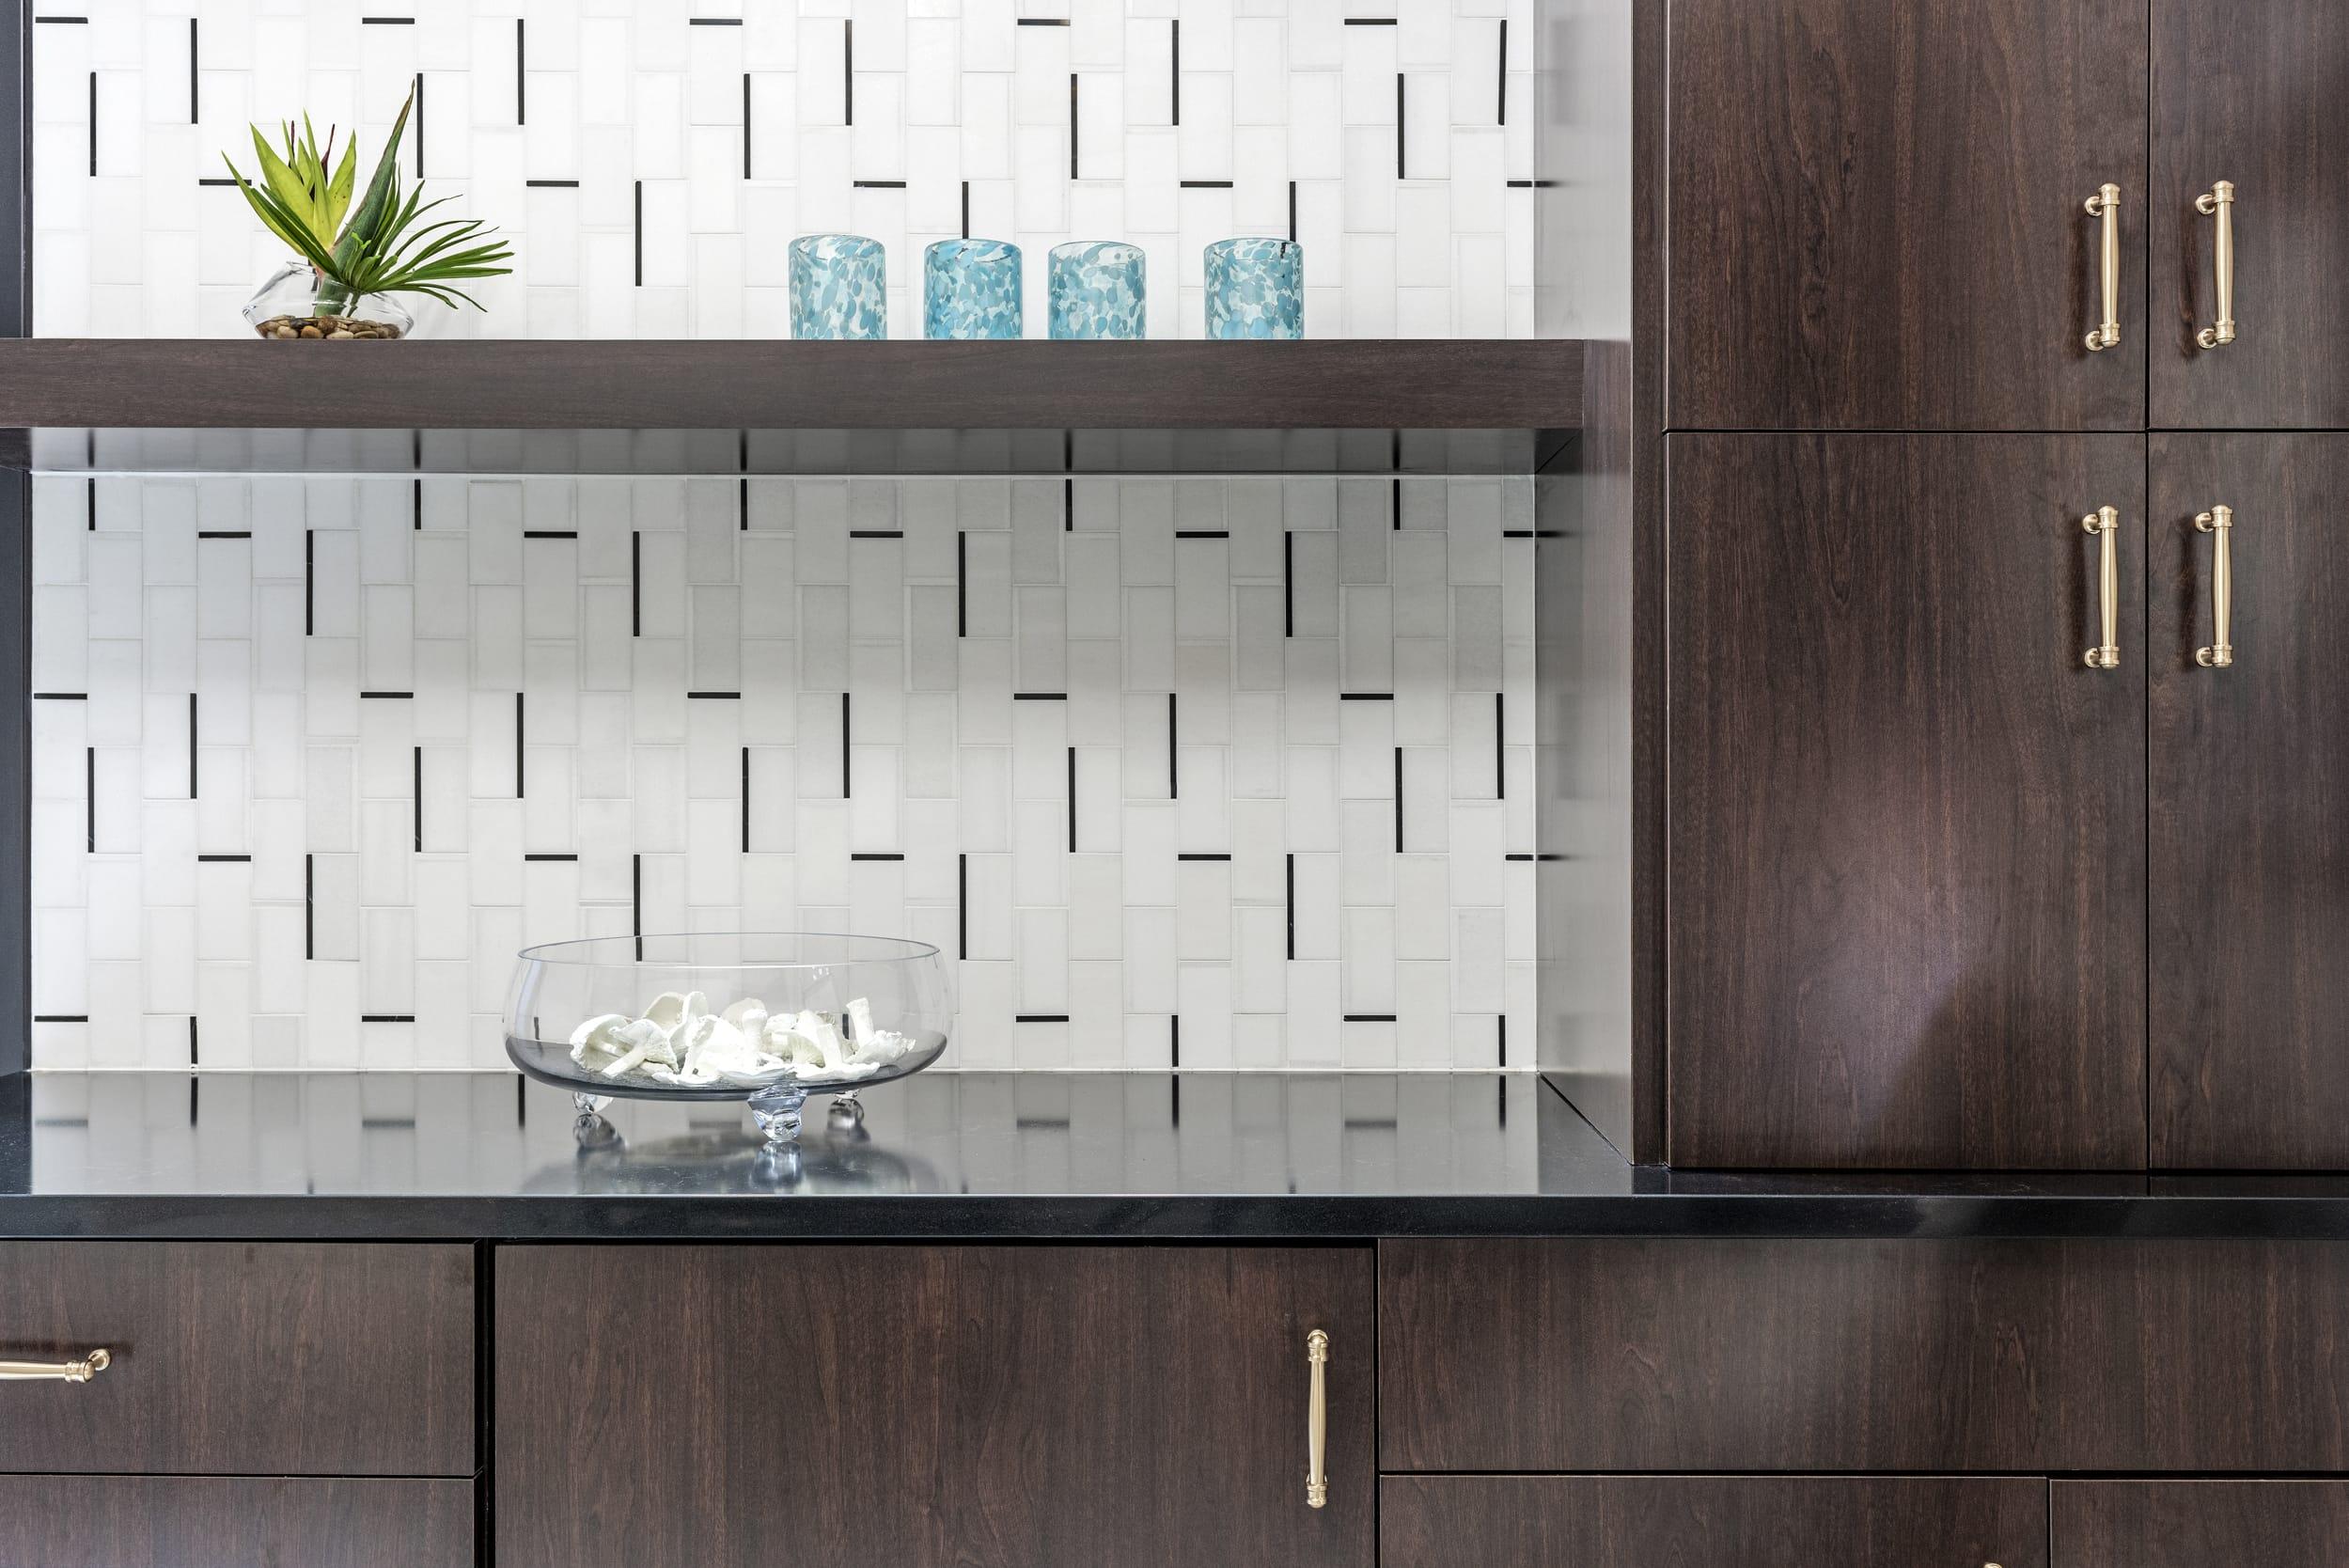 Hazelnut Cabinets Brass Handles White Tile With Linear Black Line Pattern Blue Spec Glasses